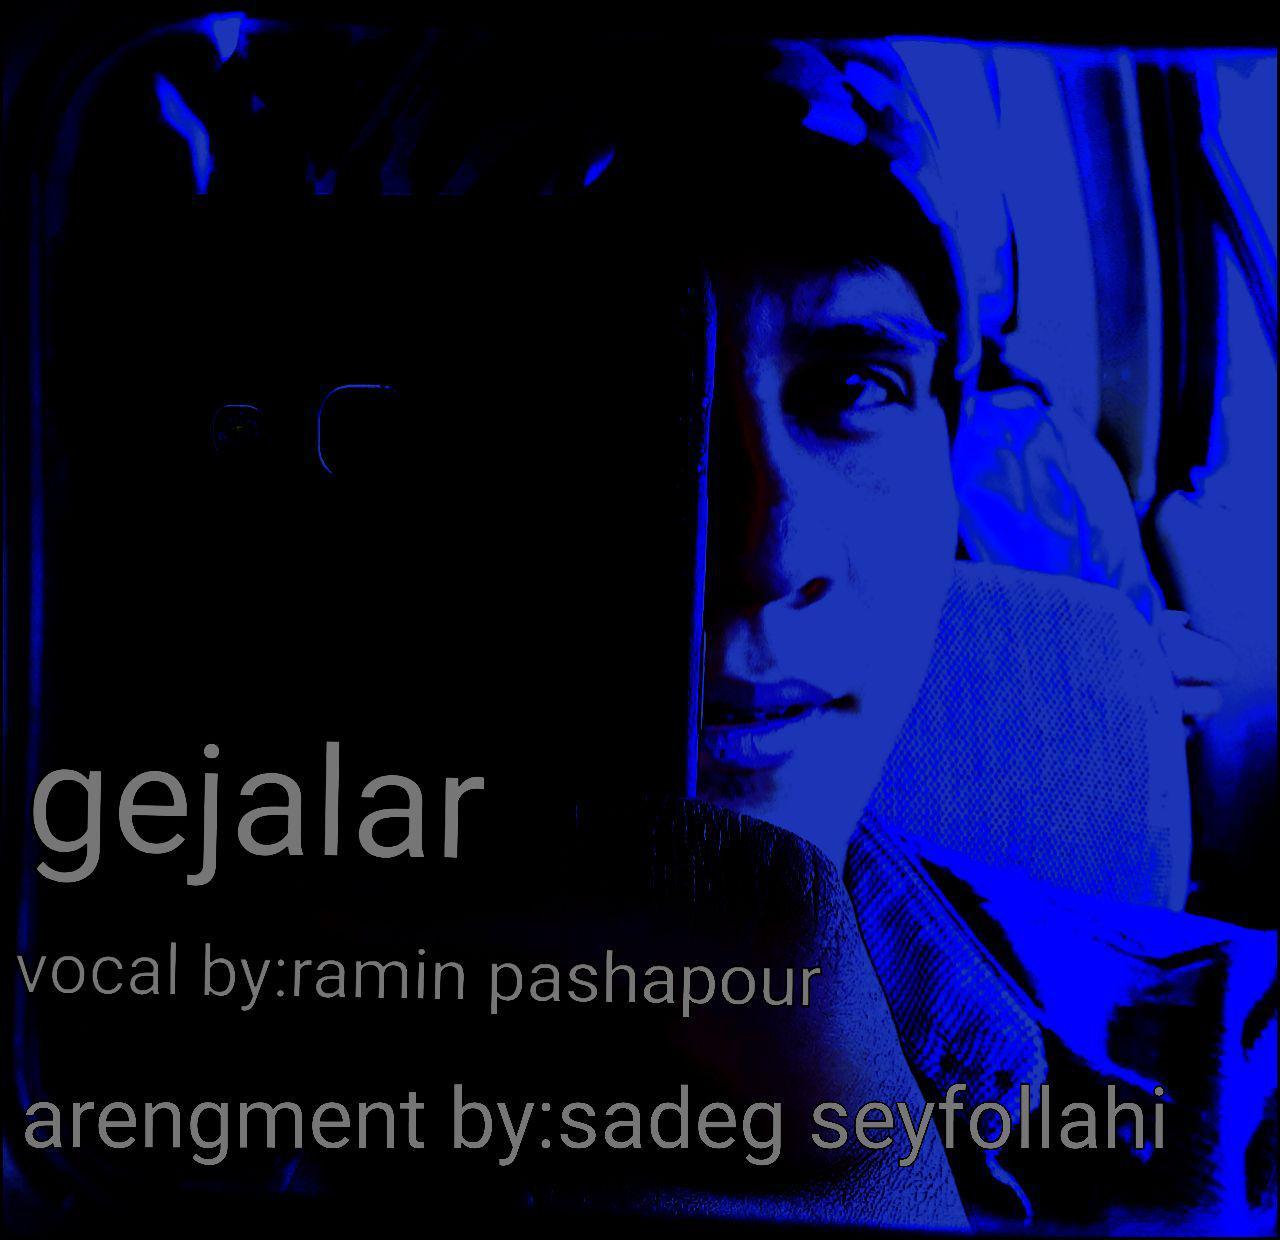 http://s8.picofile.com/file/8333003426/29Ramin_Pashapour_Gejalar.jpg